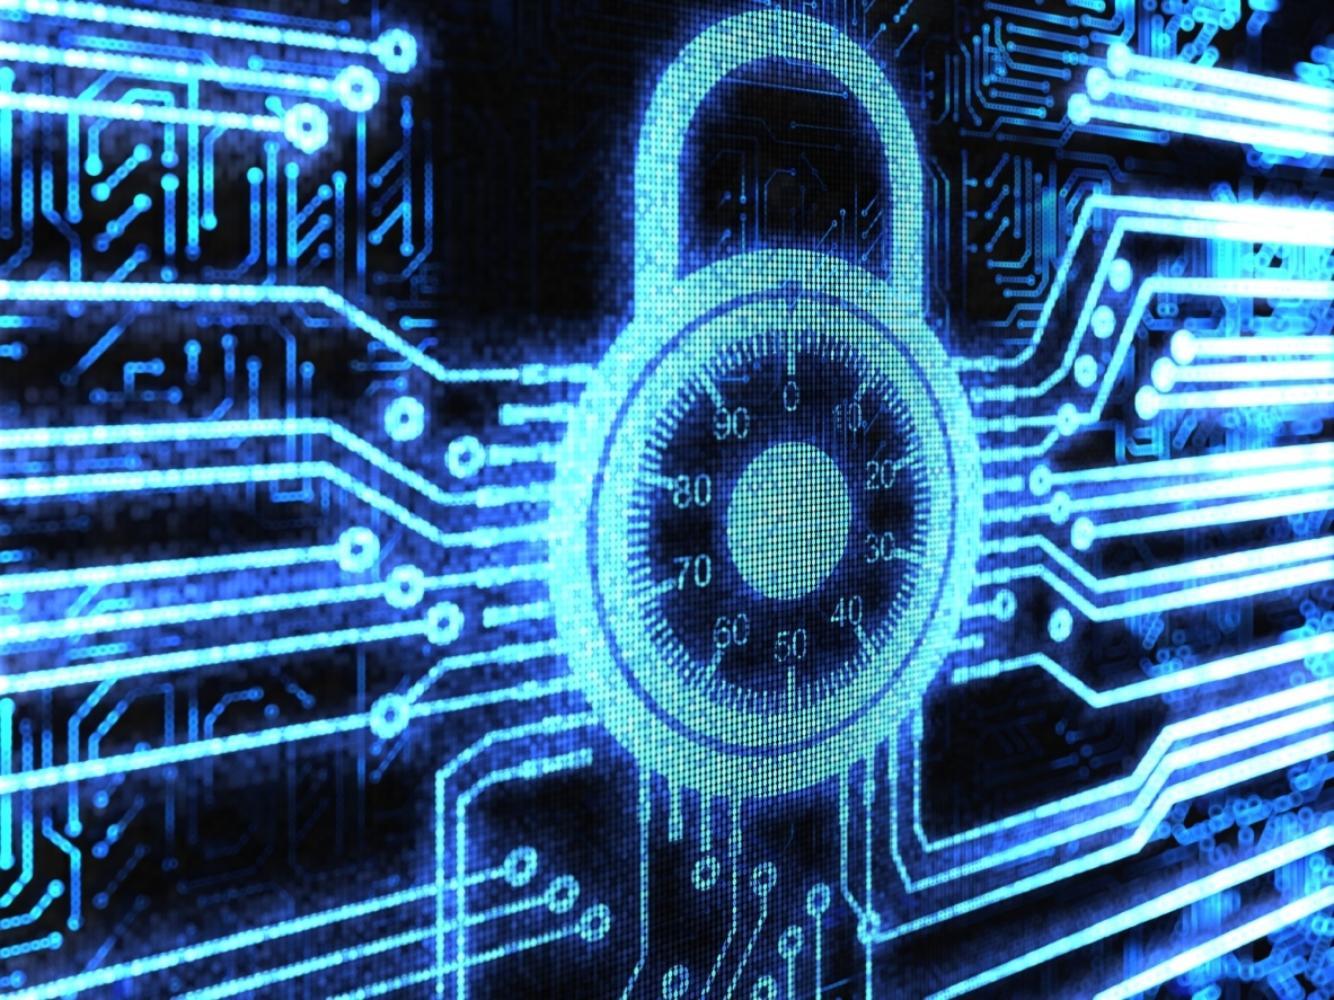 Digital padlock with combination lock